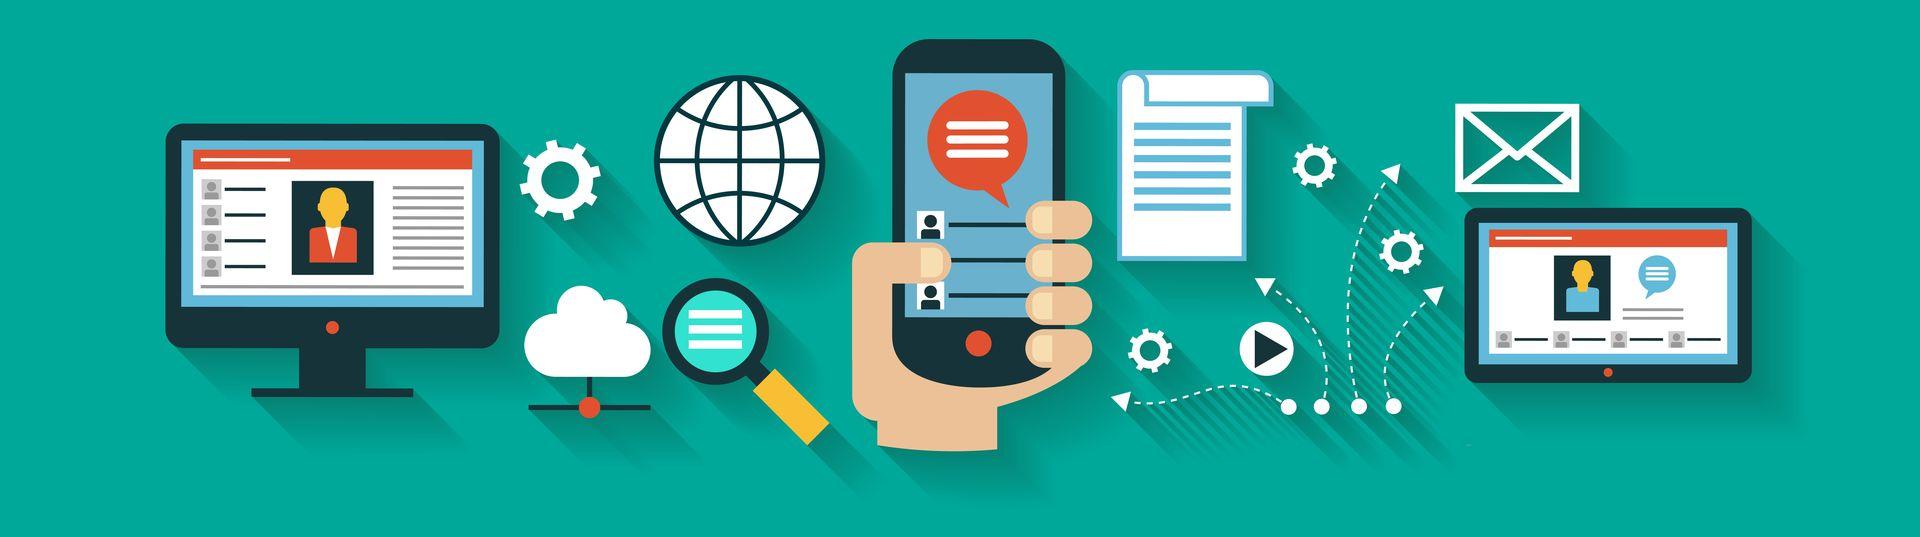 marketings-way-digital-marketing